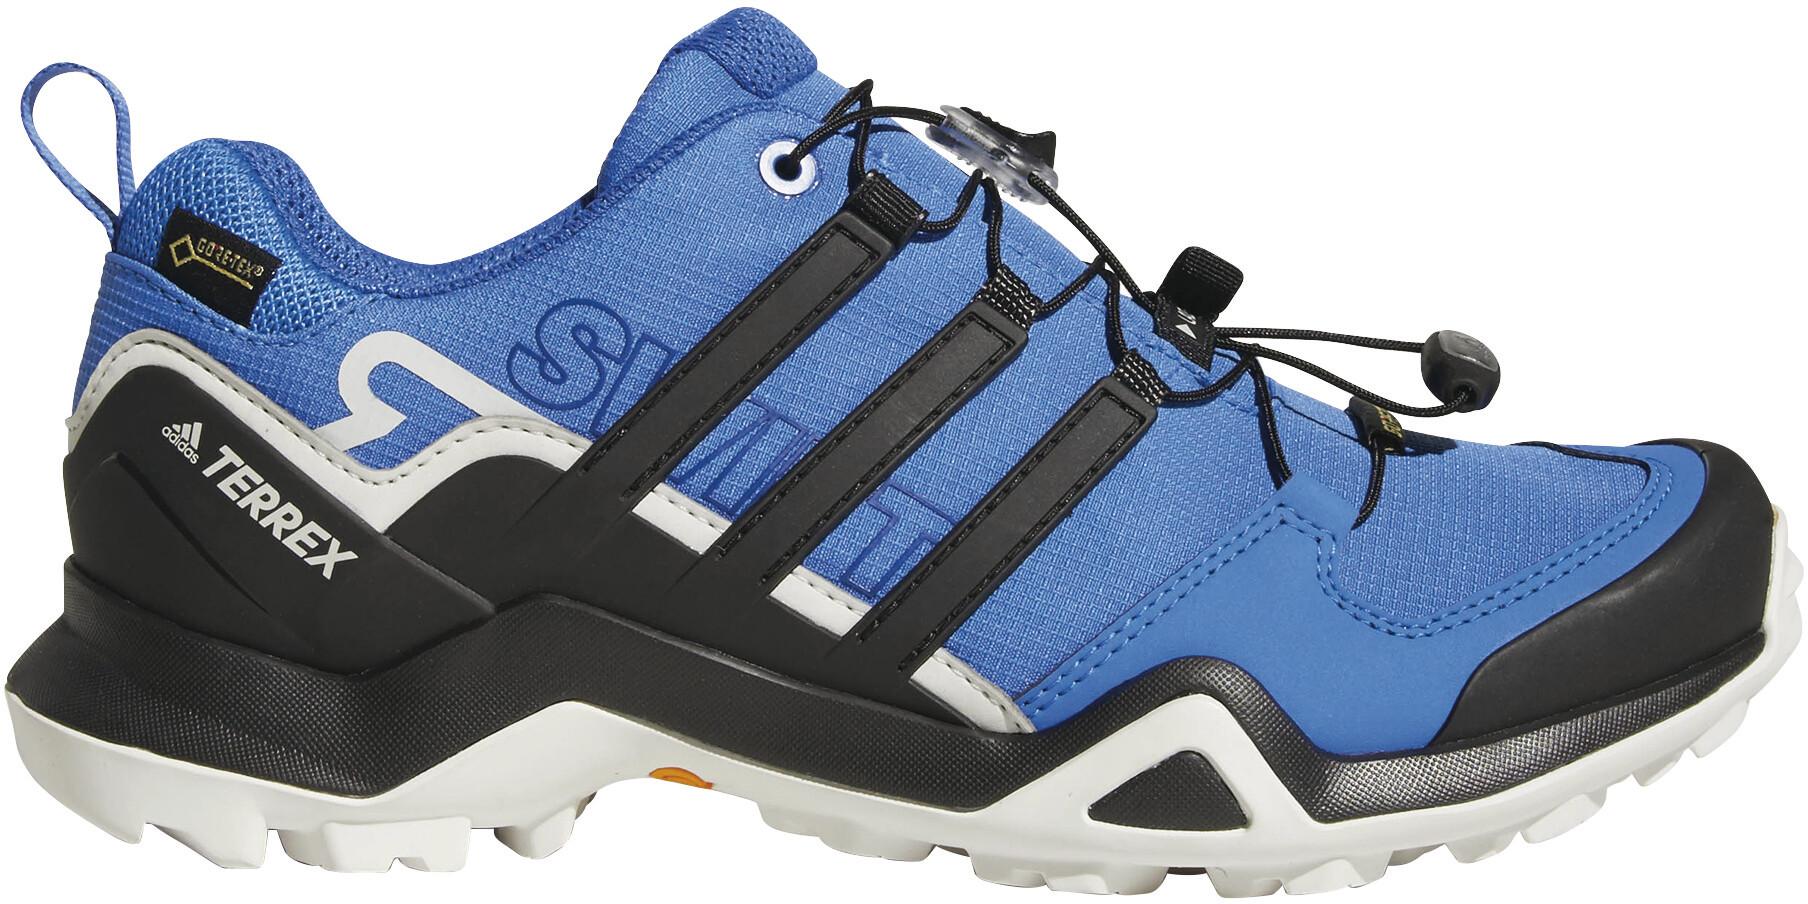 c62b67f1e0f adidas TERREX Swift R2 GTX Schoenen Dames, hi-res blue/core black ...